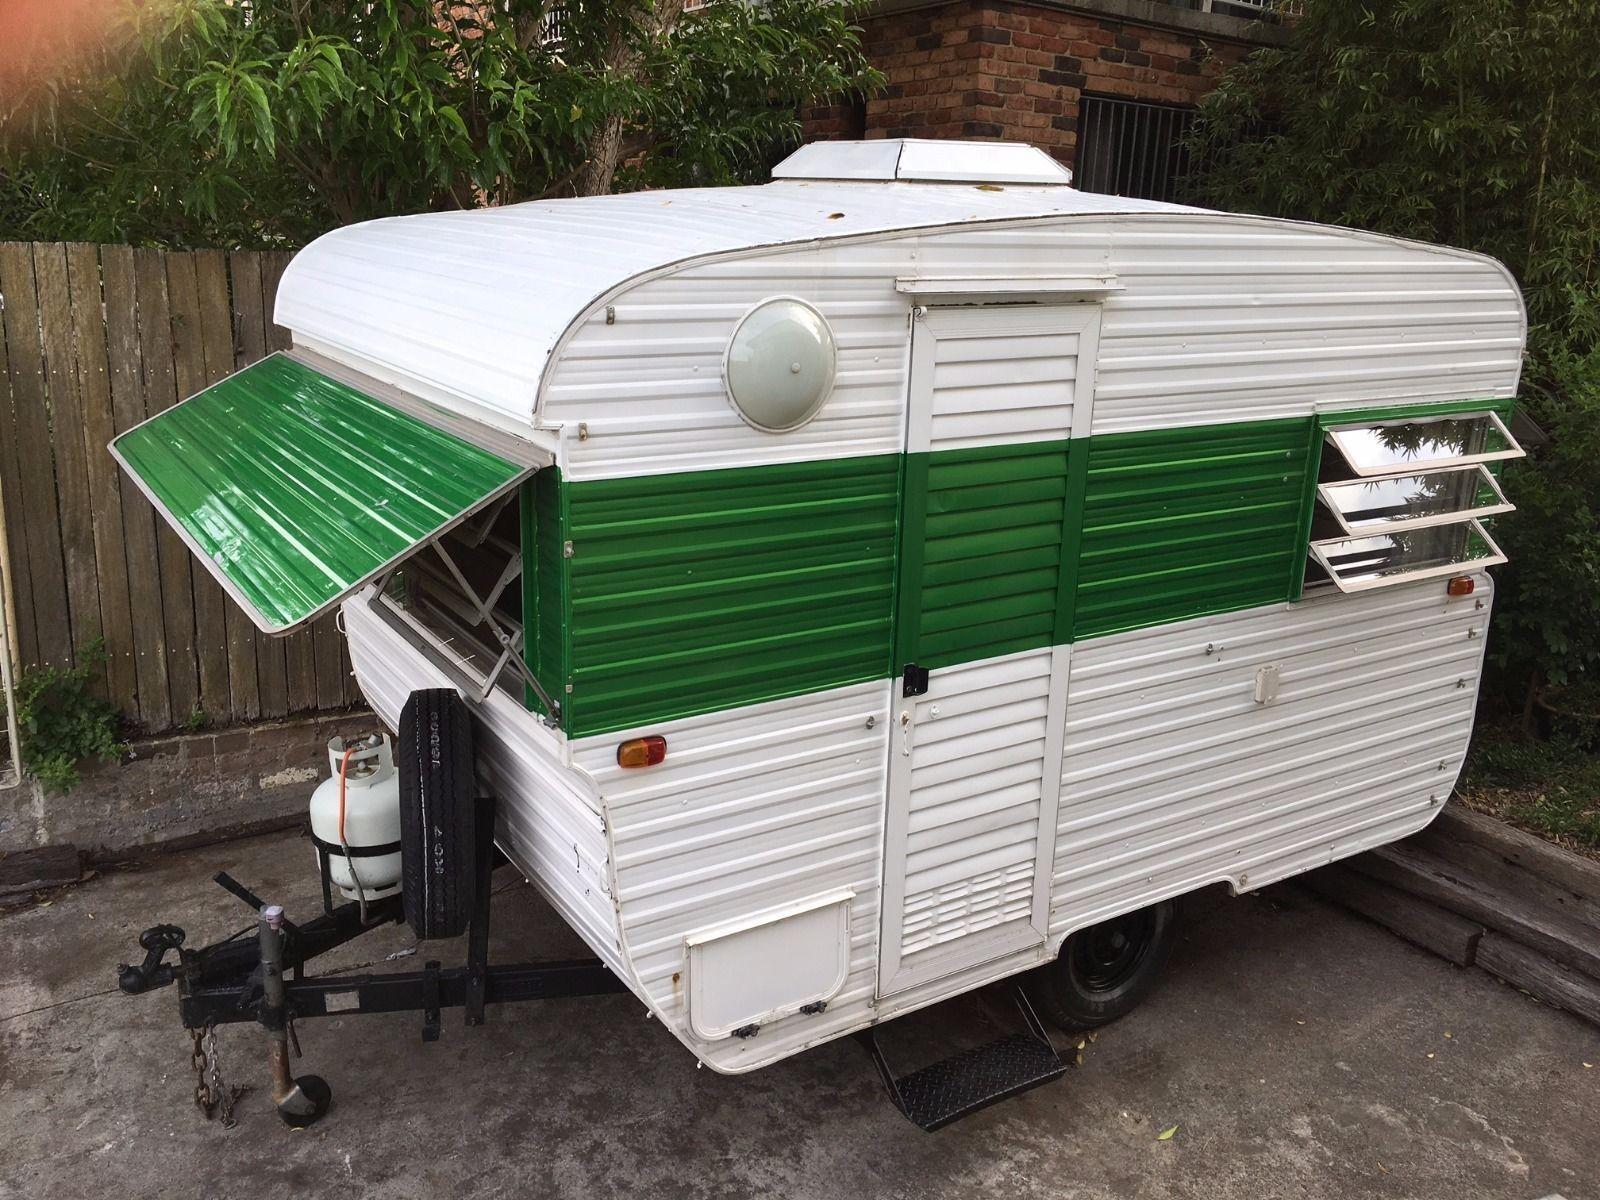 Vintage Caravans for sale   Shop with Afterpay   eBay AU